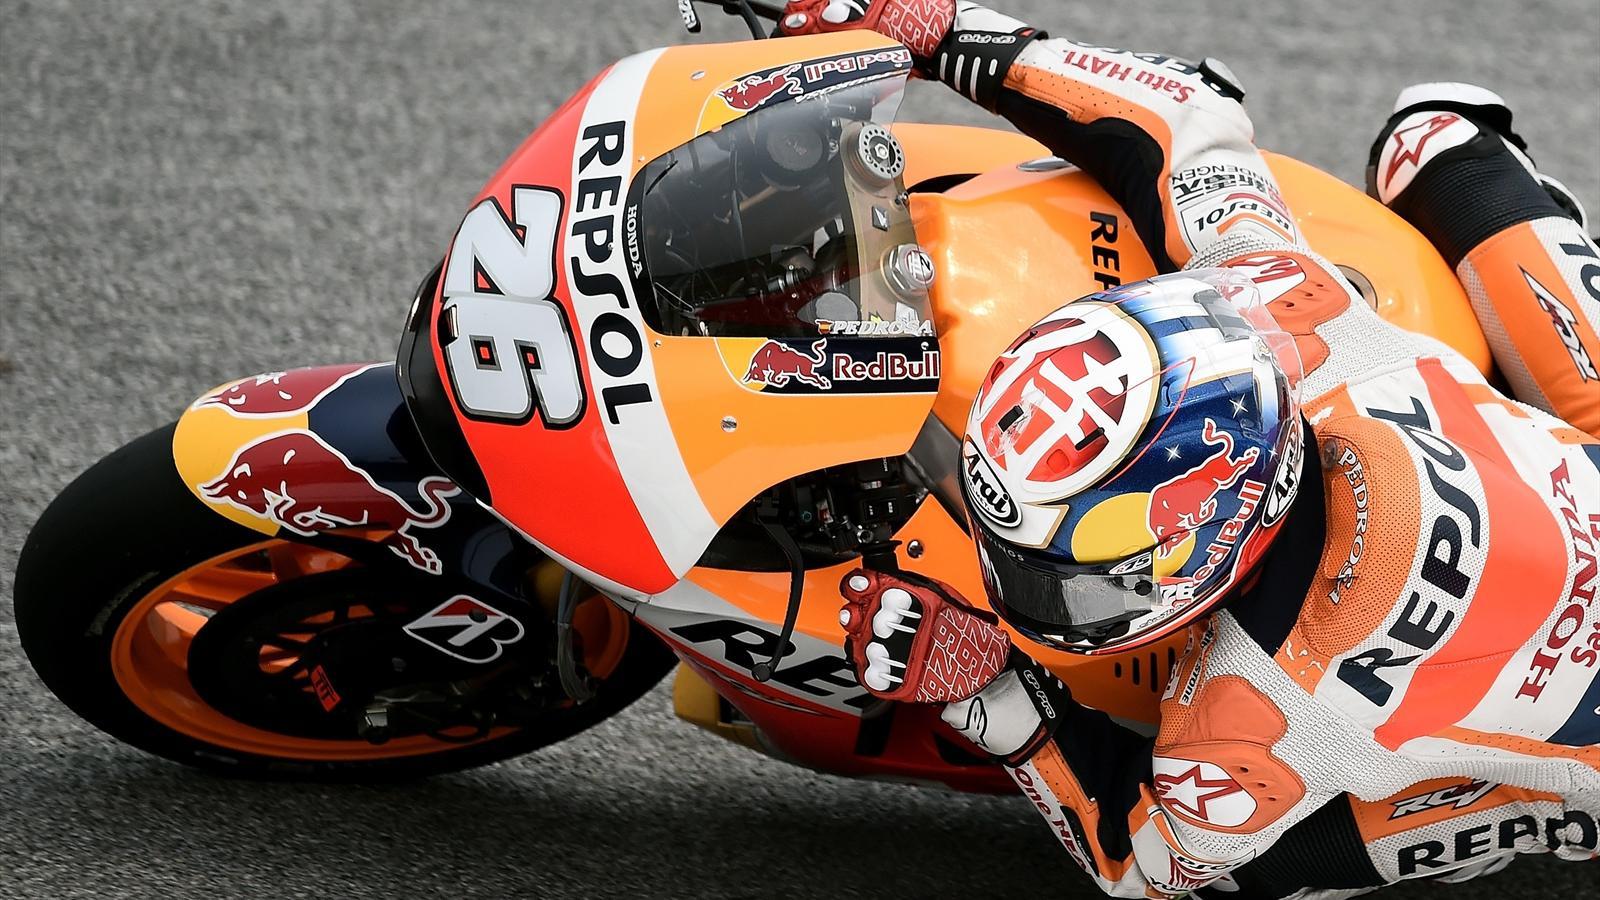 Repsol Honda Team's Spanish rider Dani Pedrosa powers his bike during the second practice session of the MotoGP Malaysian Grand Prix at Sepang International Circuit on October 23, 2015